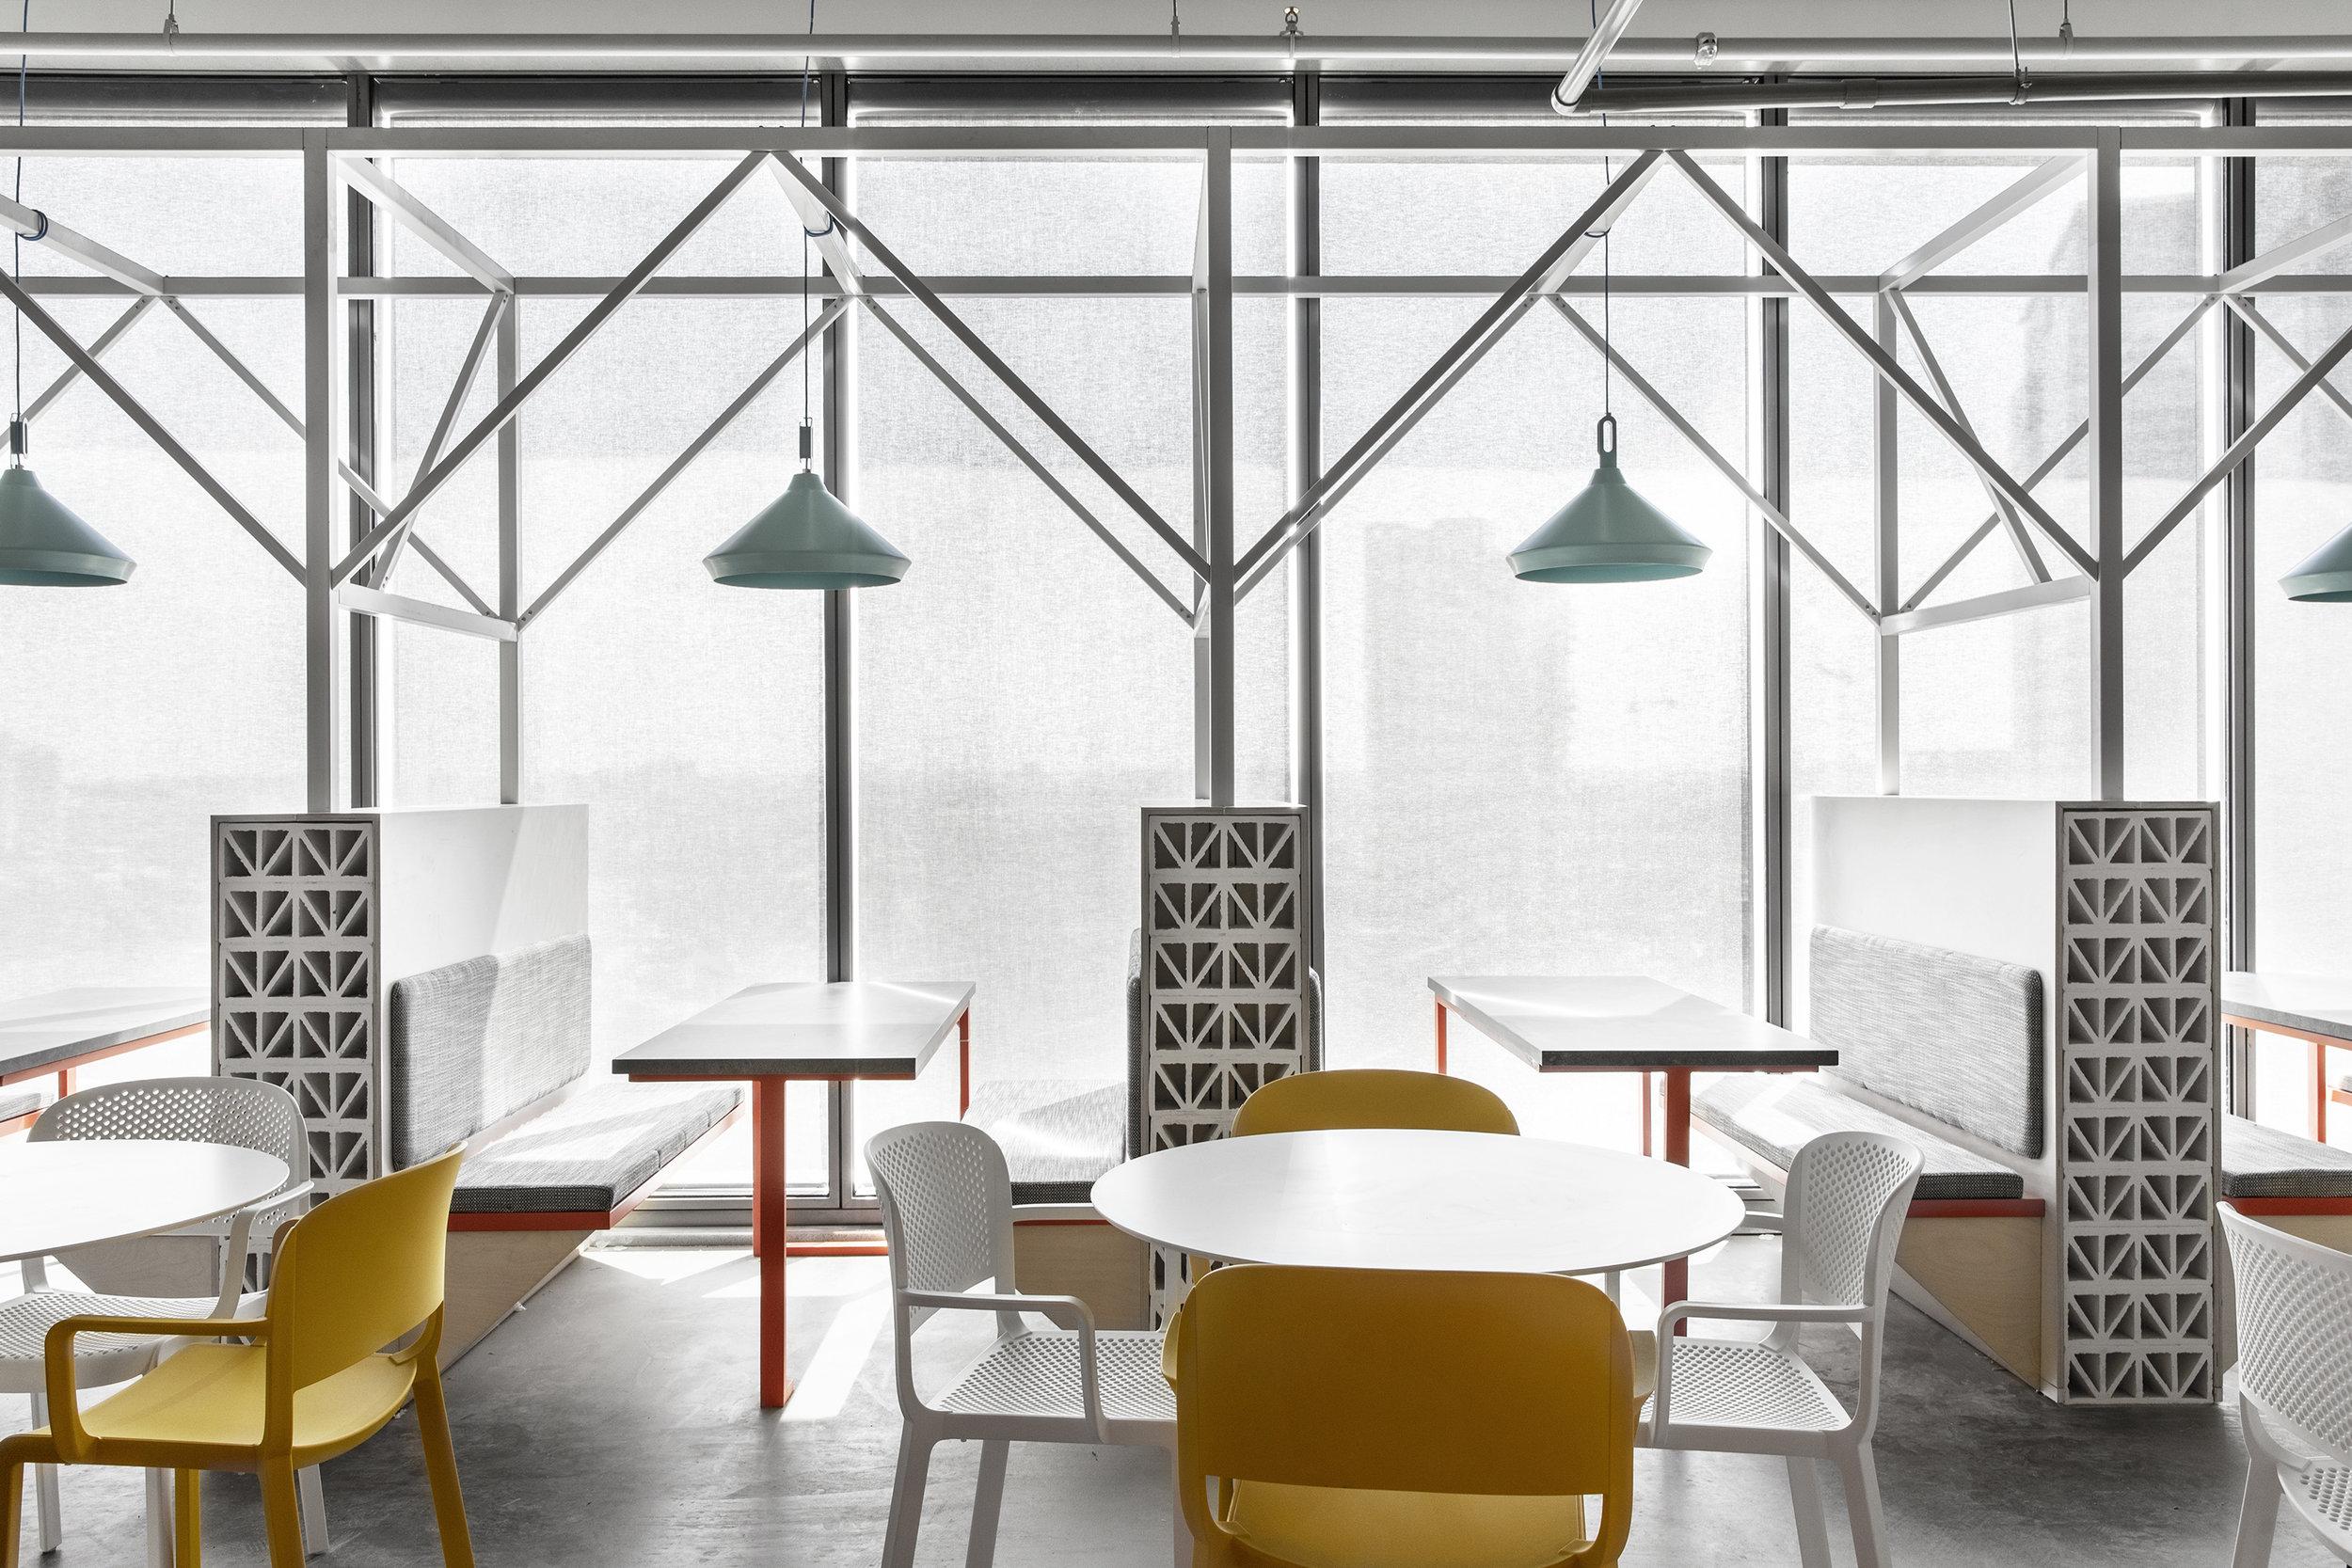 AKAMAI - ROY DAVID ARCHITECTURE - STUDIO - רואי דוד אדריכלות - אדריכלים - סטודיו - אקמאי (11).jpg